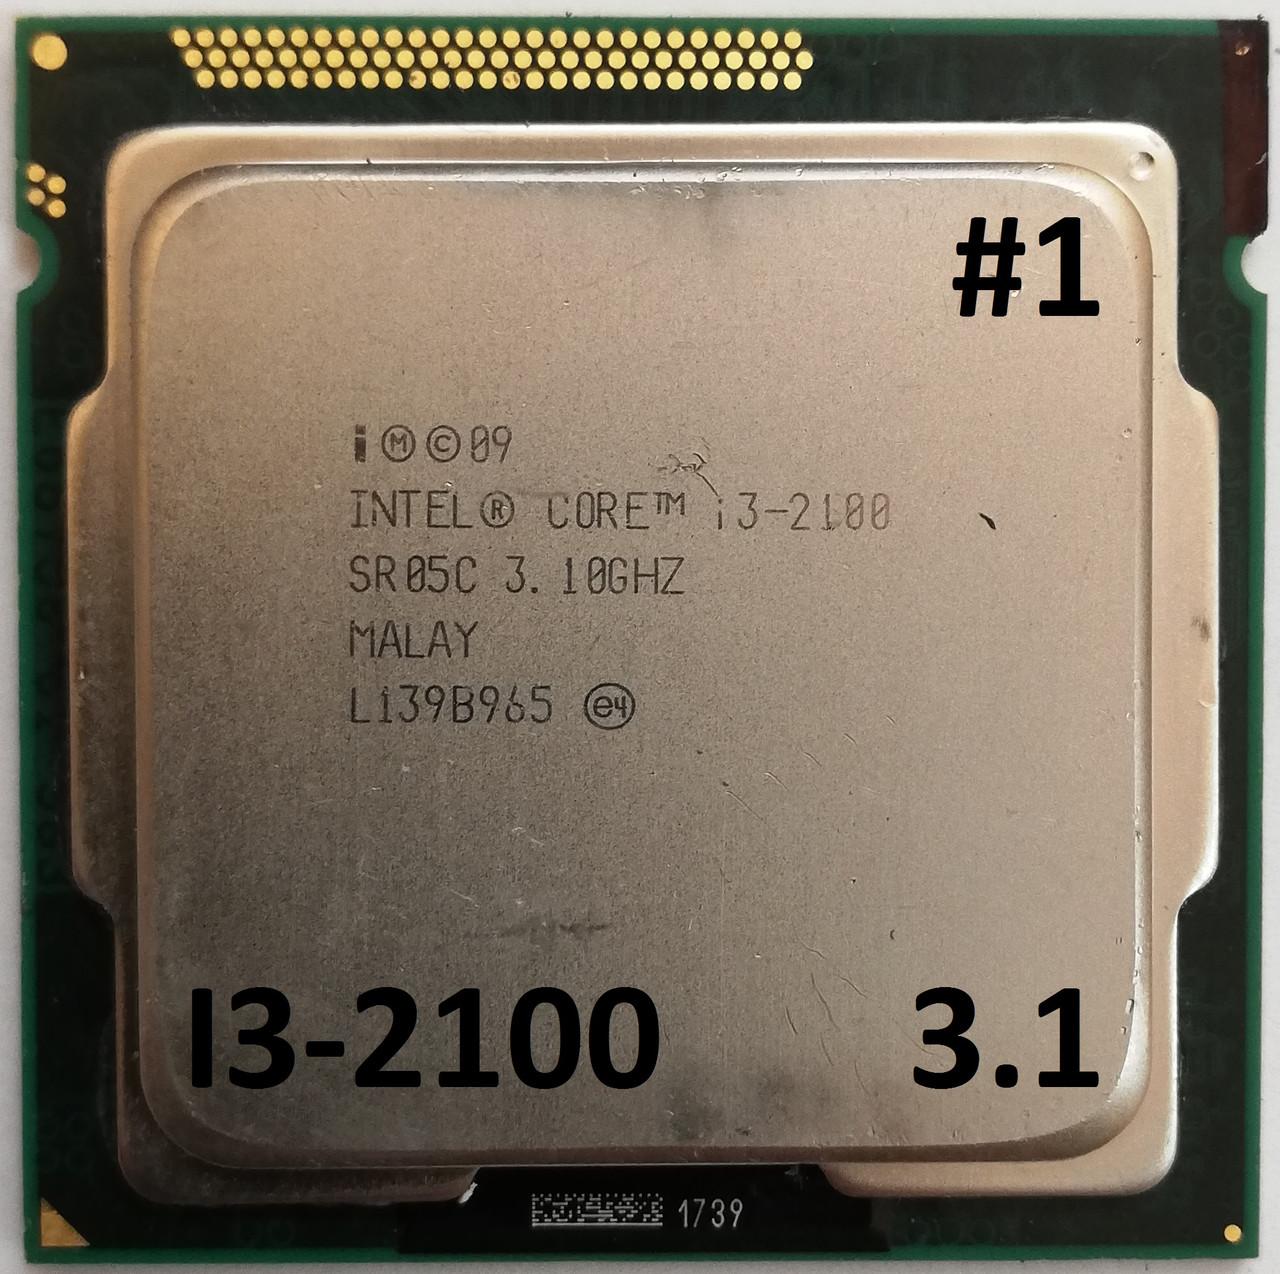 Процессор Intel ЛОТ#1 Core i3-2100 SR05C 3.1GHz 3M Cache Socket 1155 Б/У